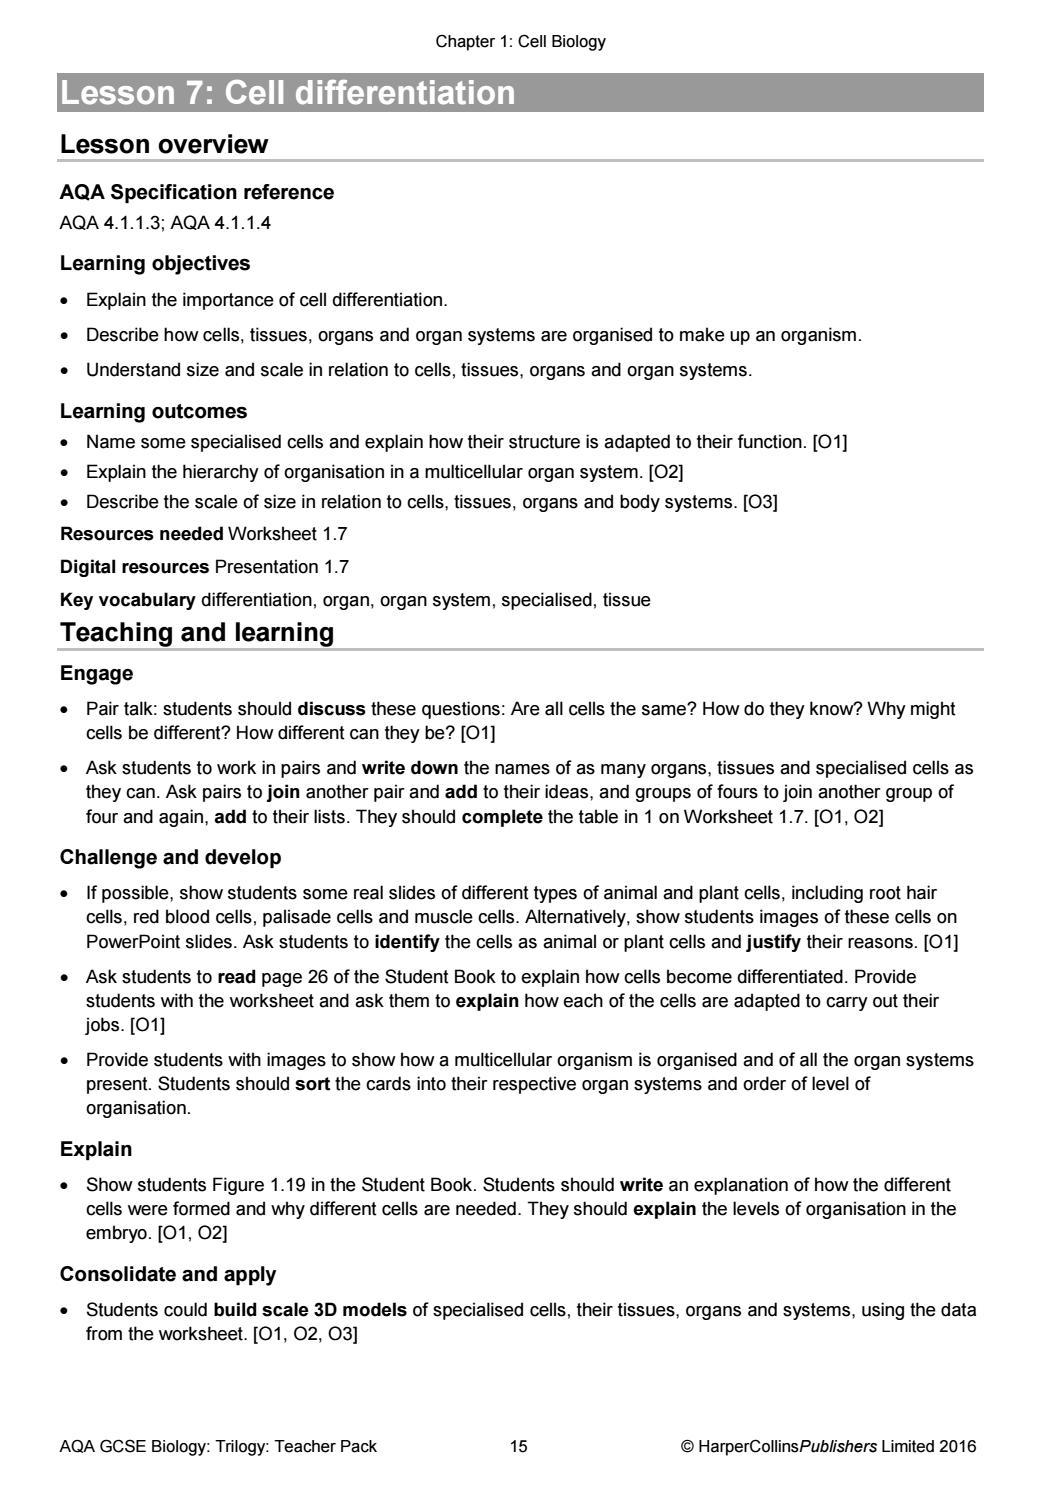 worksheet Biology Gcse Worksheets aqa gcse 9 1 combined science trilogy teacher pack by collins issuu